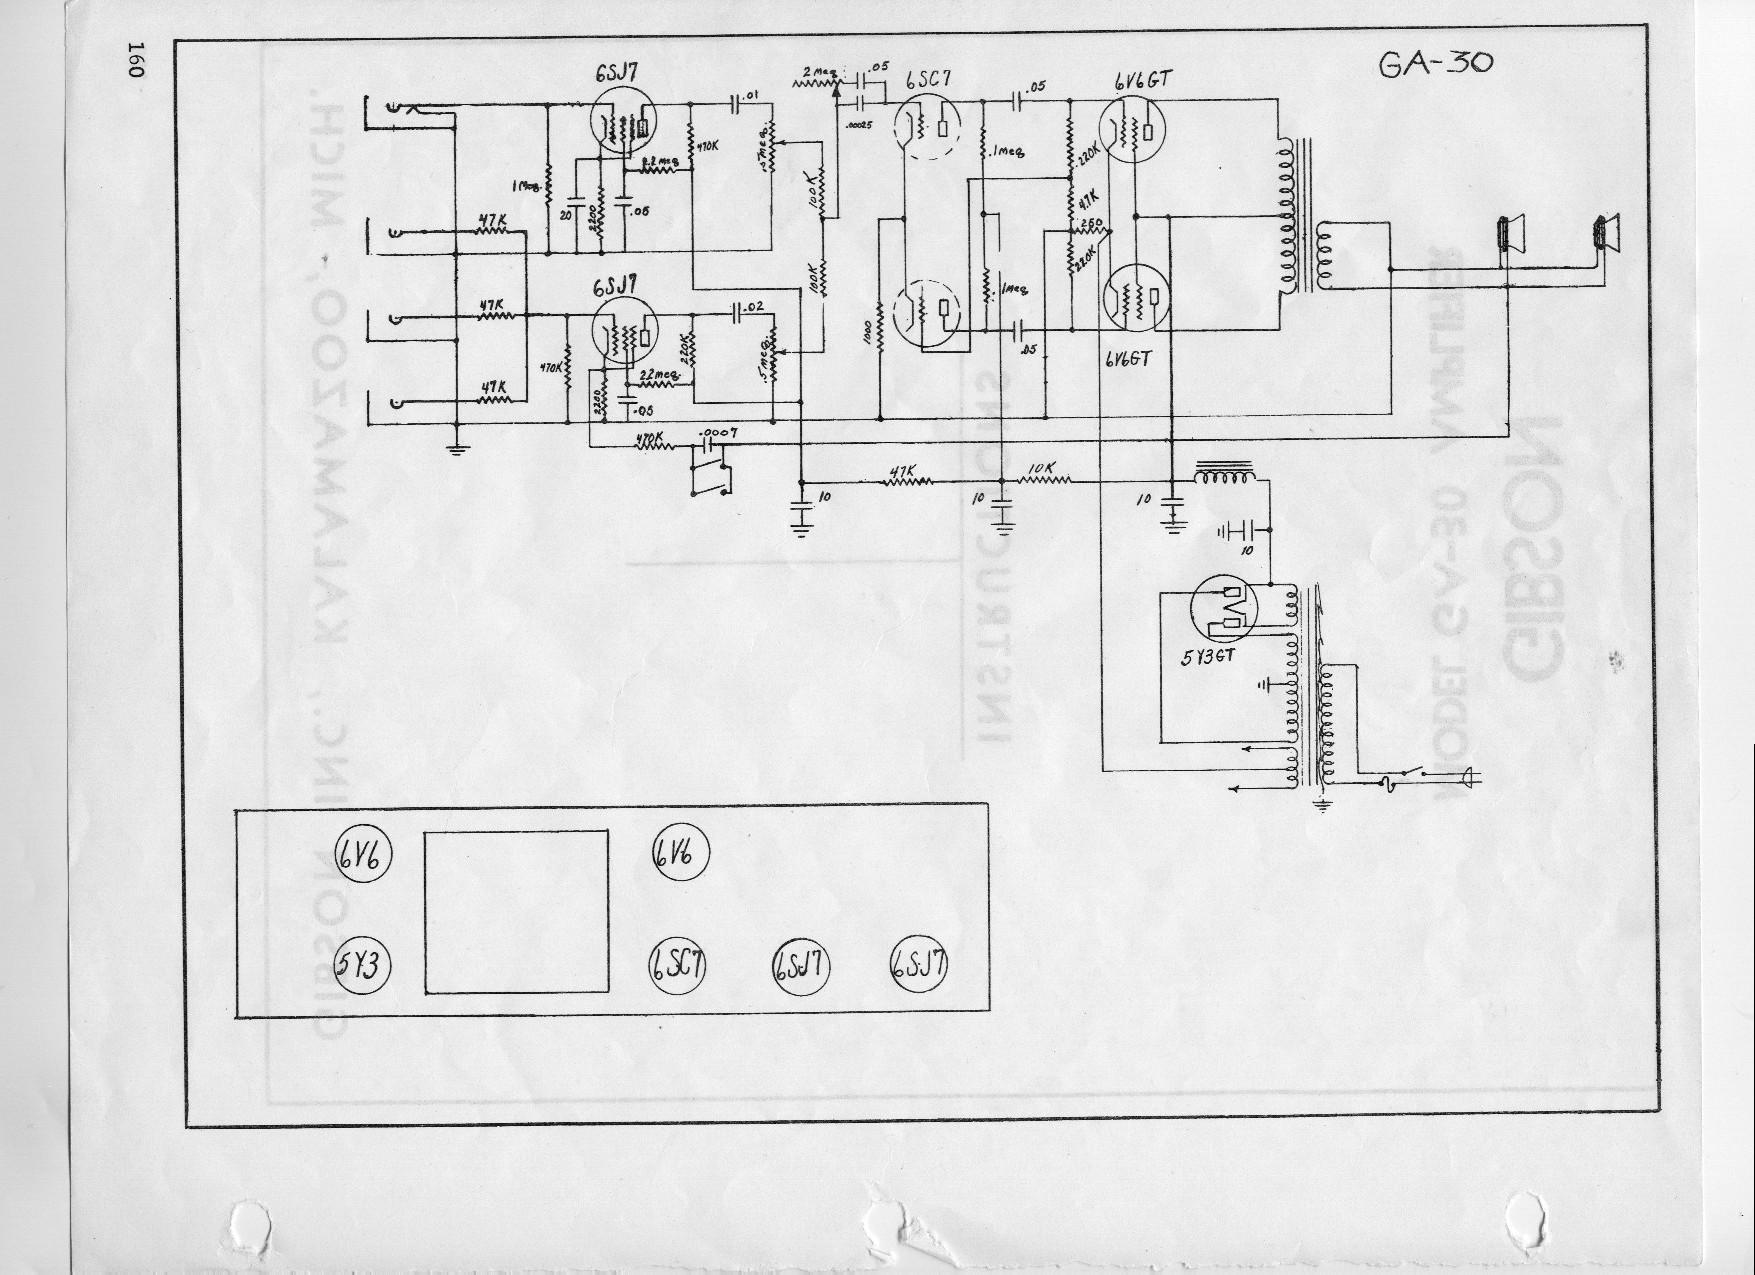 schematics and manuals